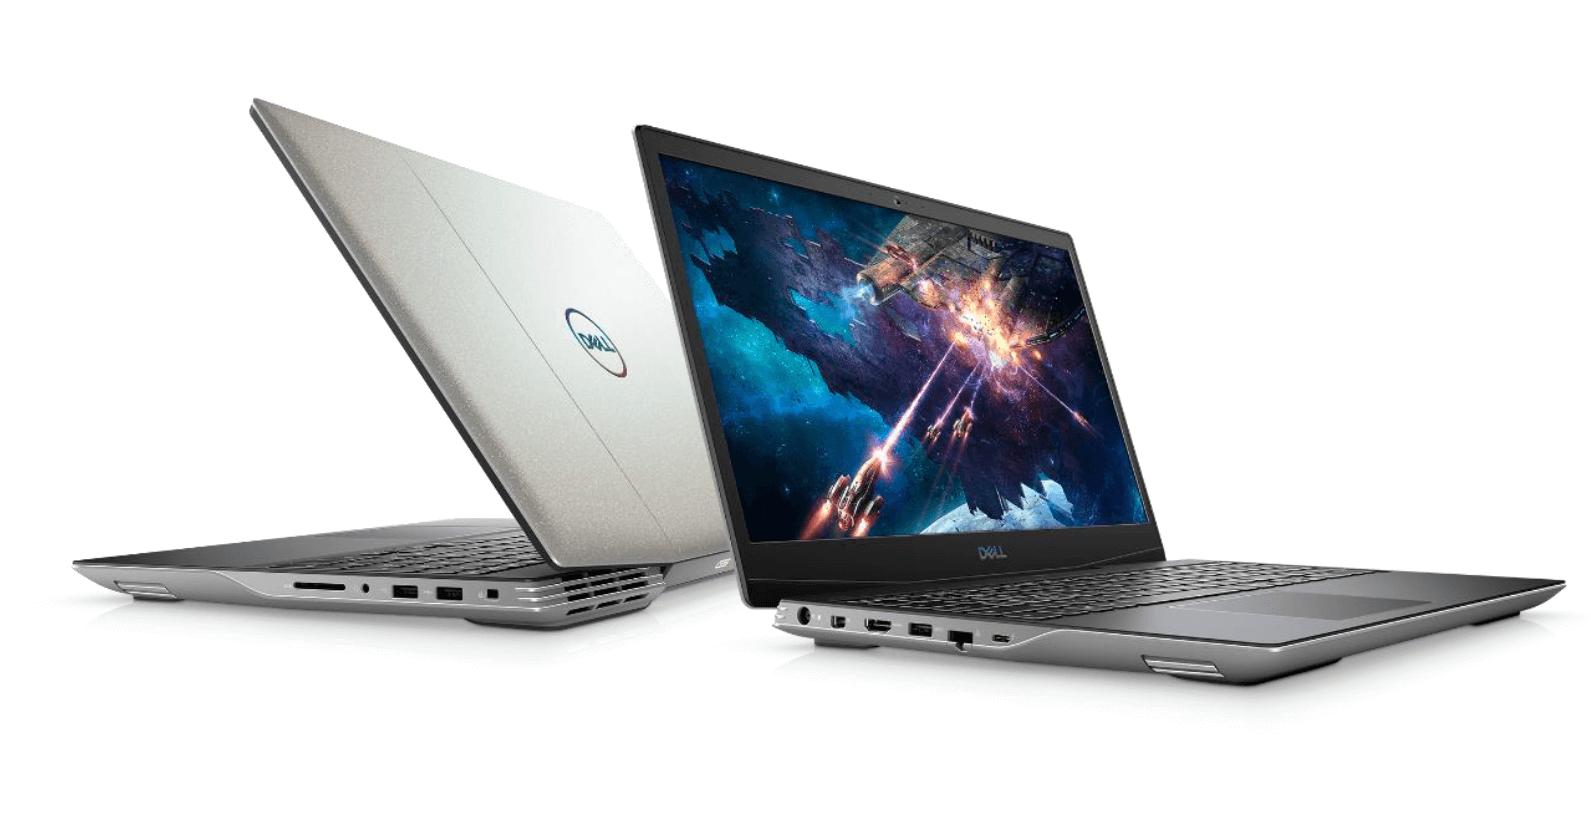 Dell G5 15 SE AMD Ryzen 4000 CPU AMD Radeon RX GPU Notebook 1